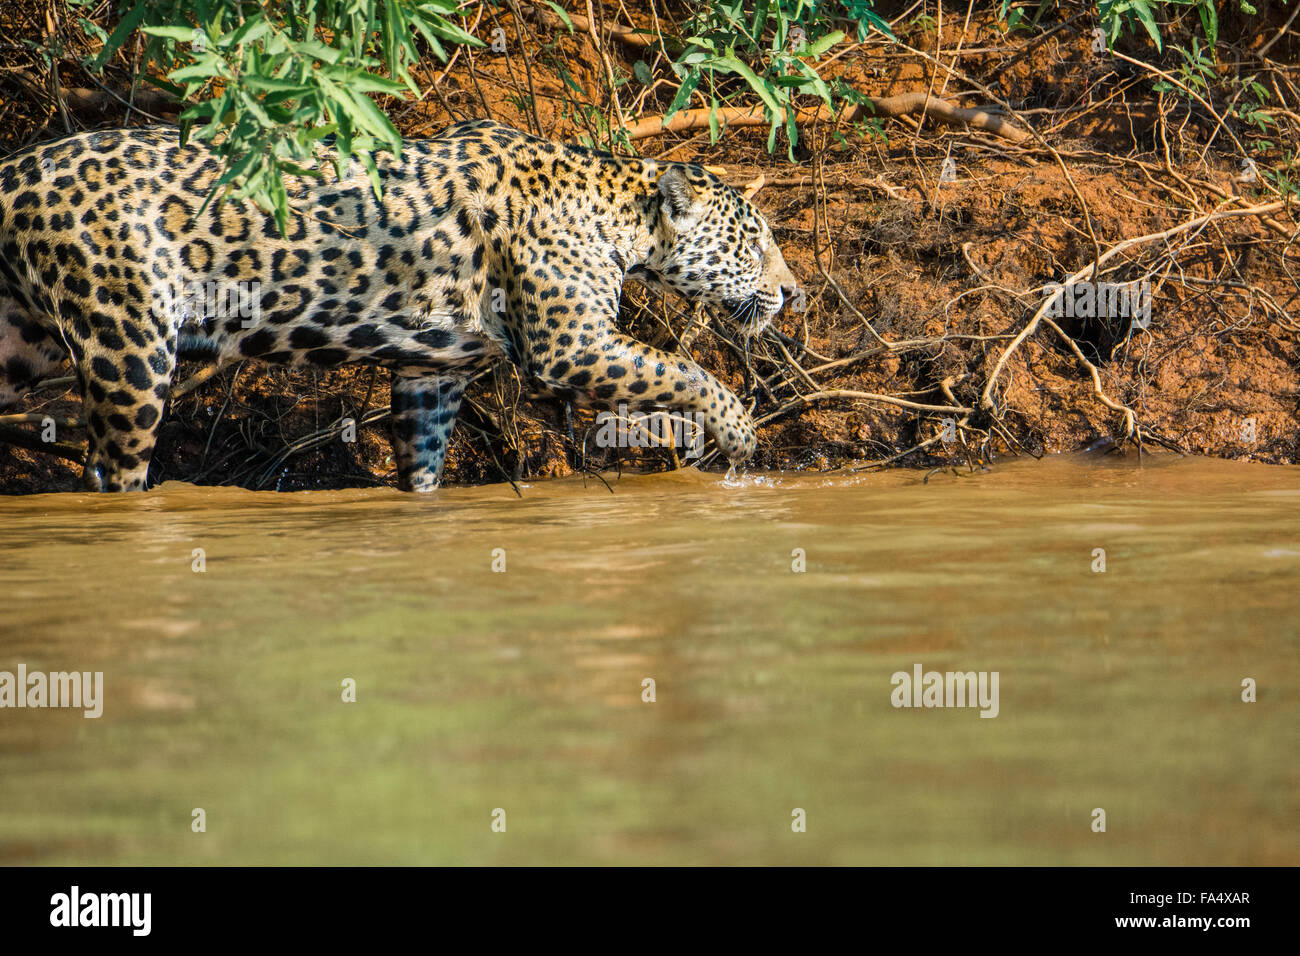 Profil eines Jaguars, Panthera Onca Jagd entlang eines Flusses in das Pantanal, Mato Grosso, Brasilien, Südamerika Stockbild